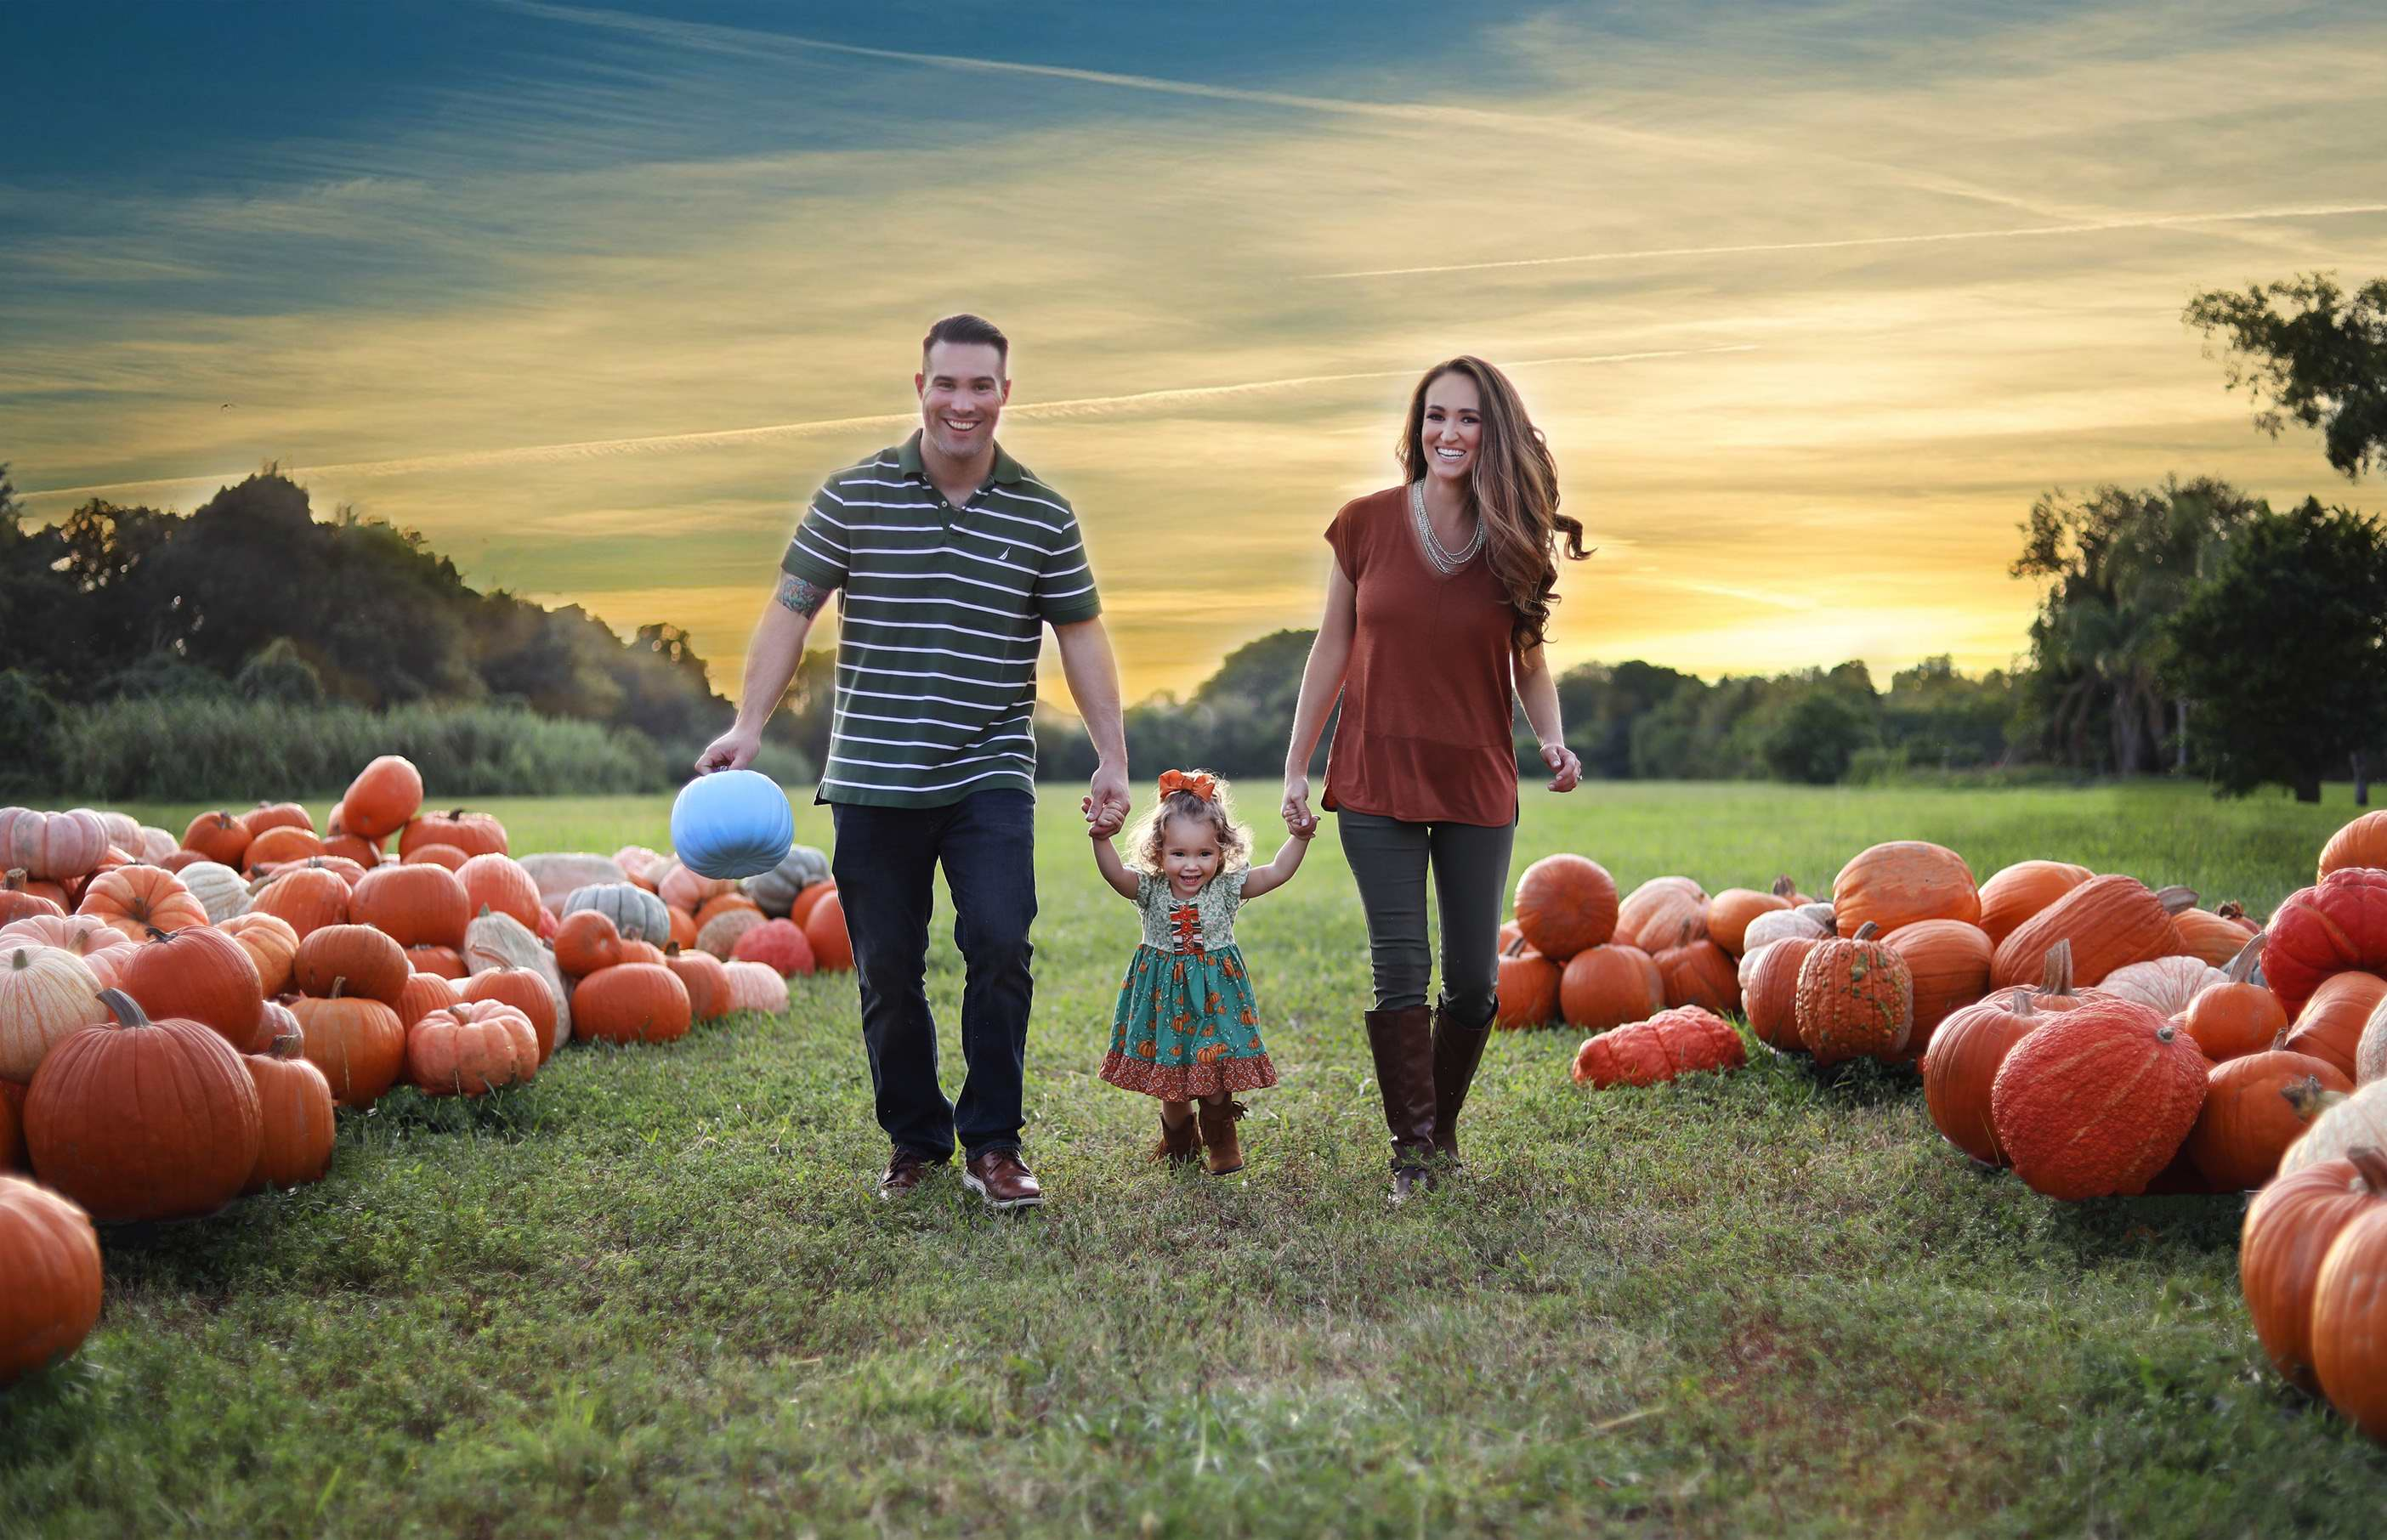 – 19 b Gender reveal family portrait photographer katherine eastman photography miami south florida birthday fairytale maternity newborn fall